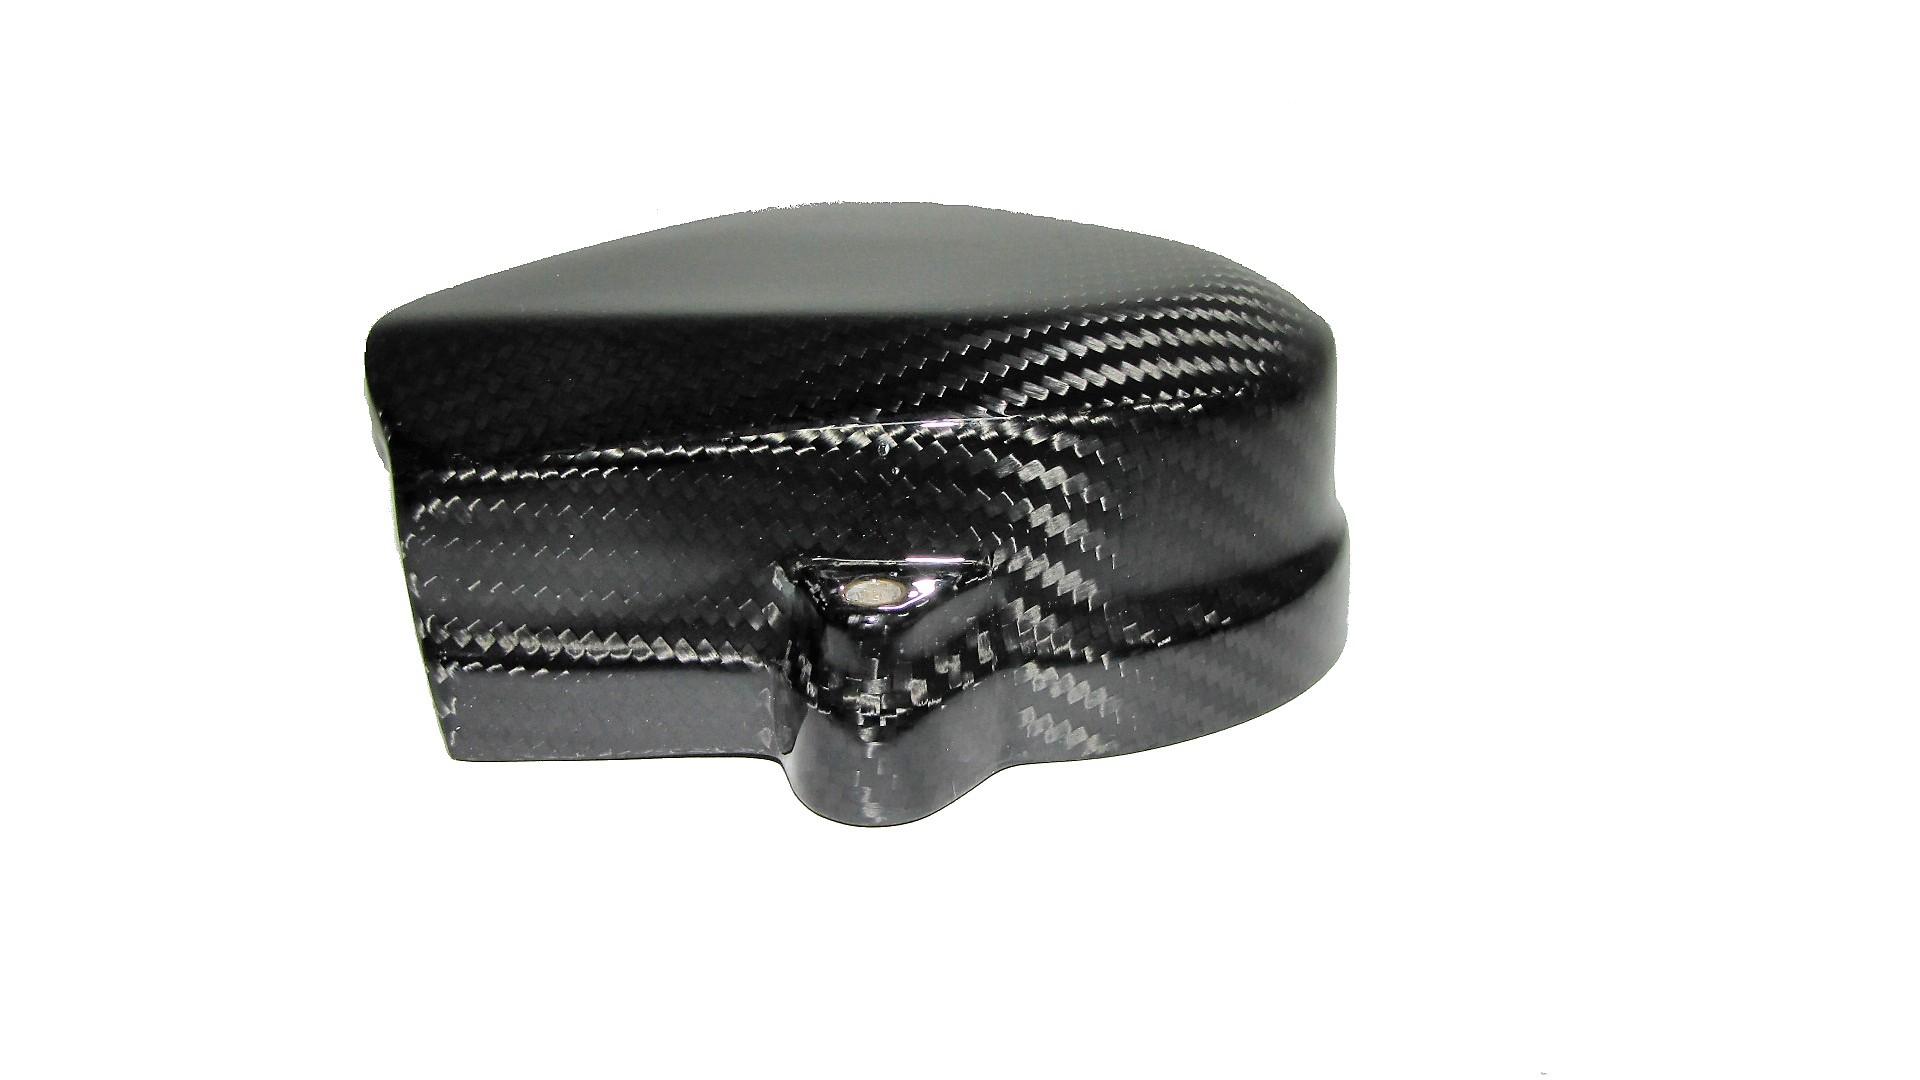 honda hornet 2004 cb 600 s f carbon ritzelabdeckung pc36. Black Bedroom Furniture Sets. Home Design Ideas